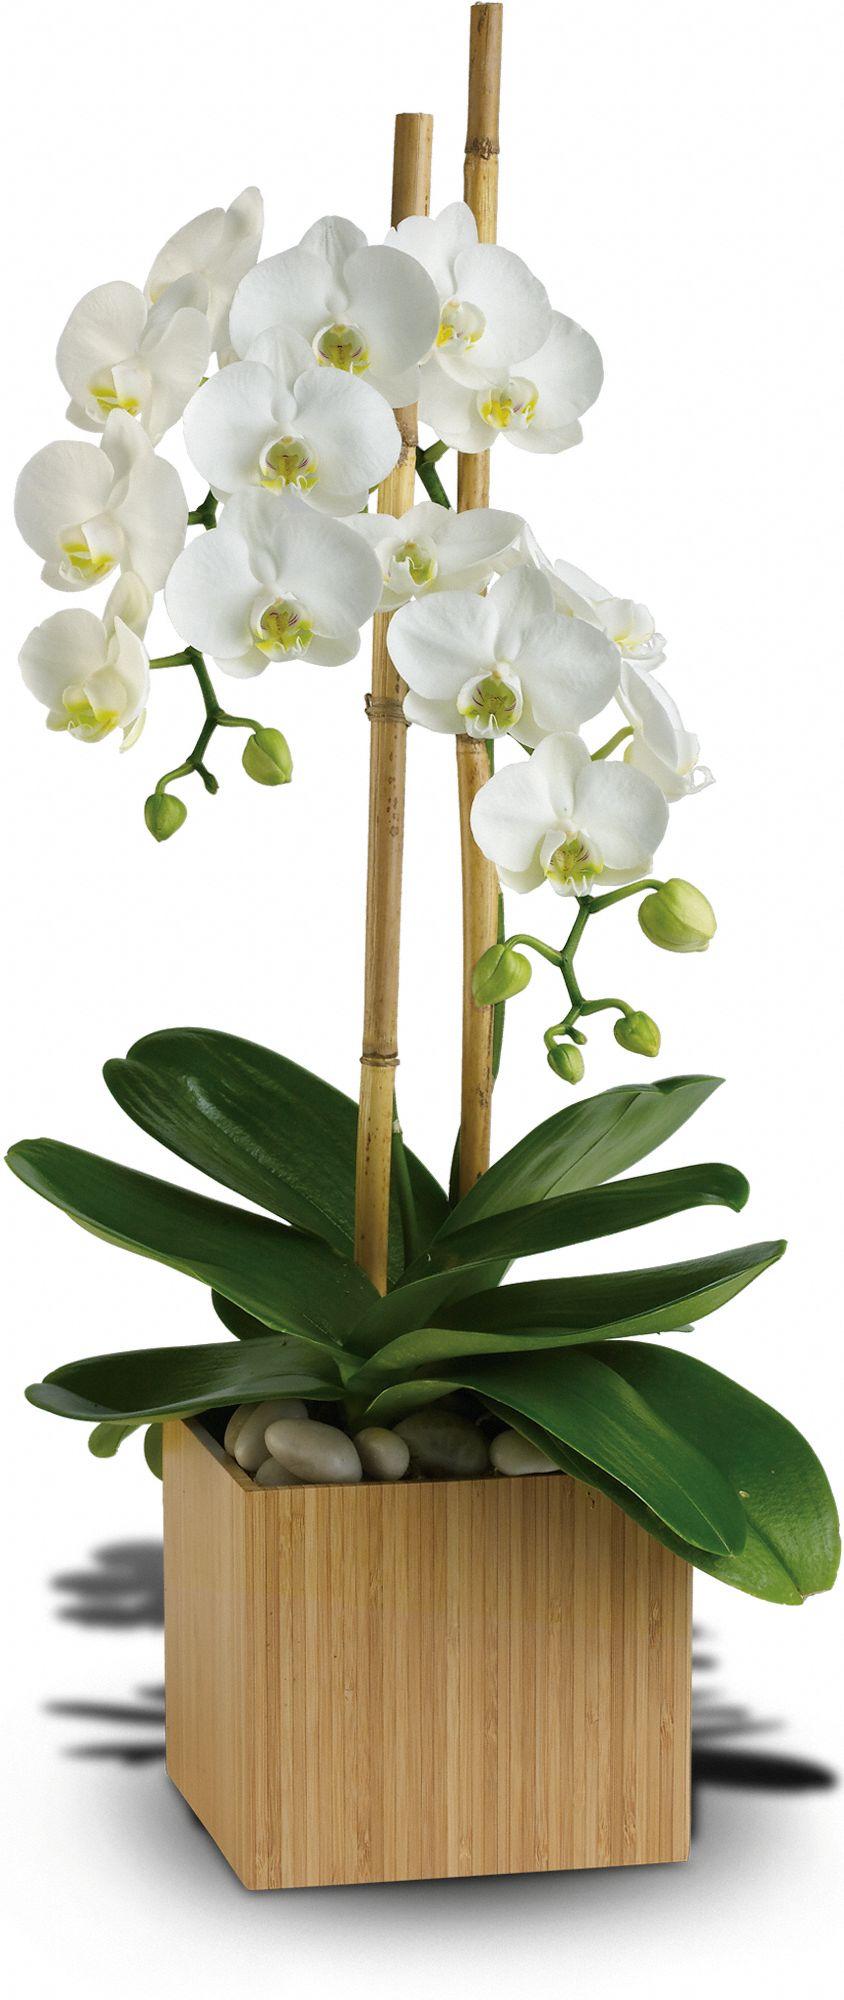 orchid flower meaning  symbolism  teleflora, Natural flower